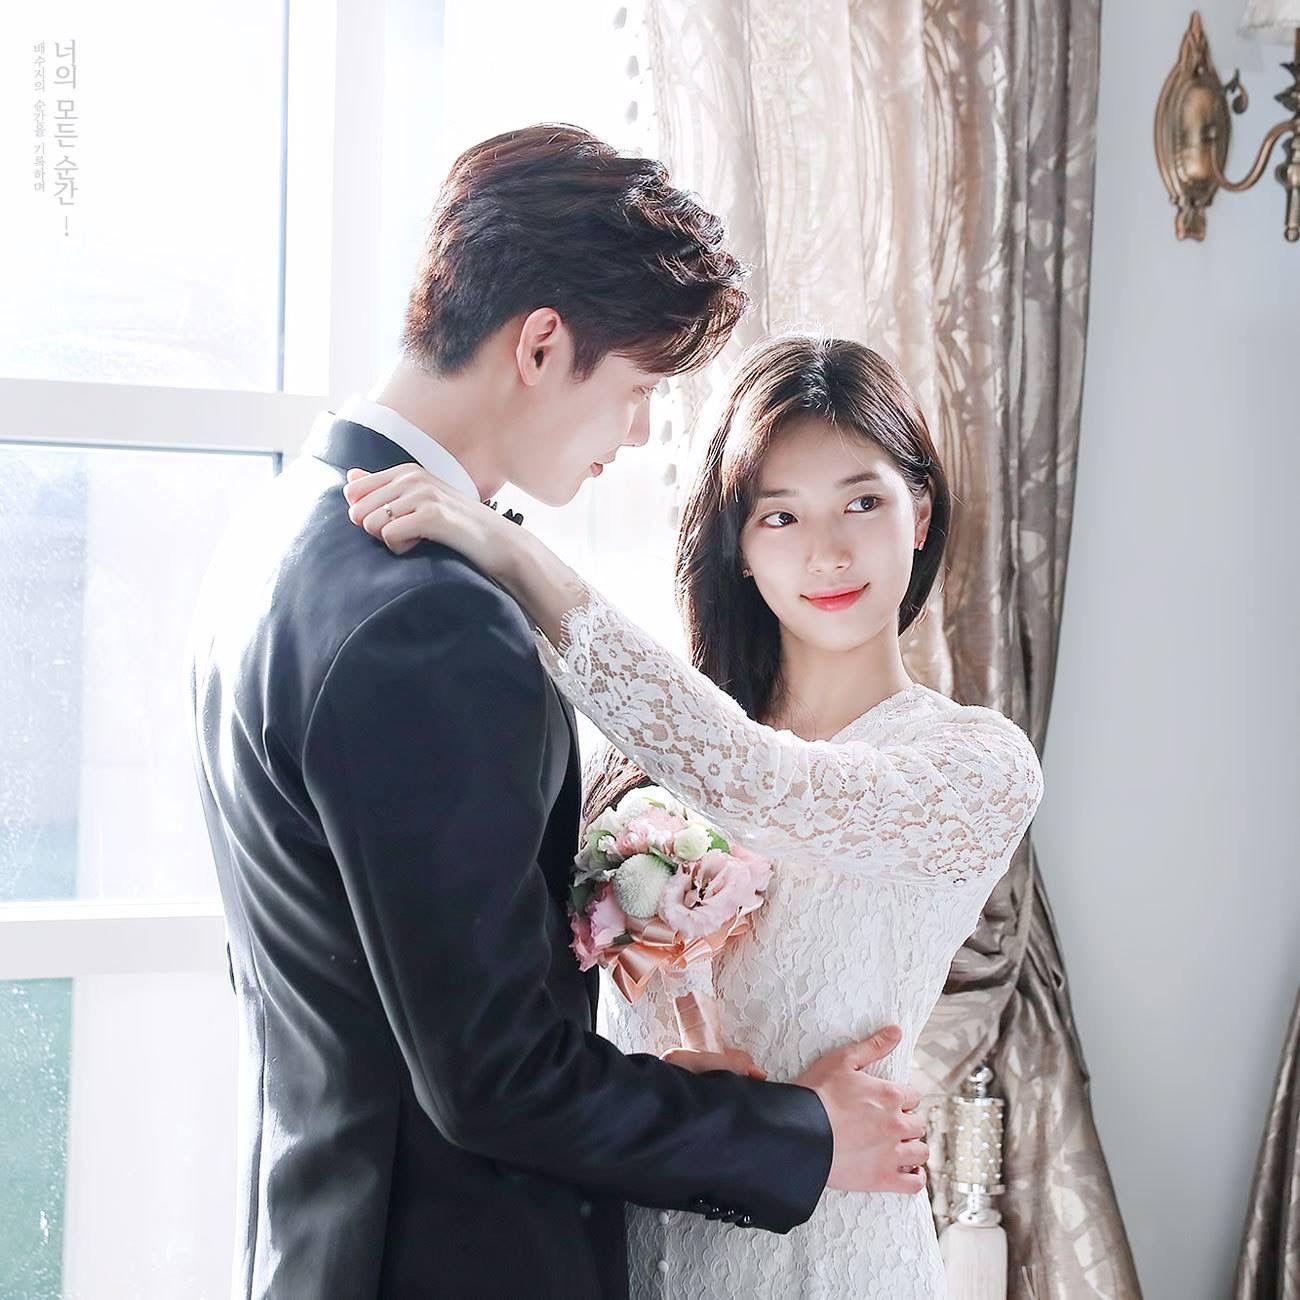 When You Were Sleeping Wallpaper Lockscreens Lee Jong Suk Bae Suzy